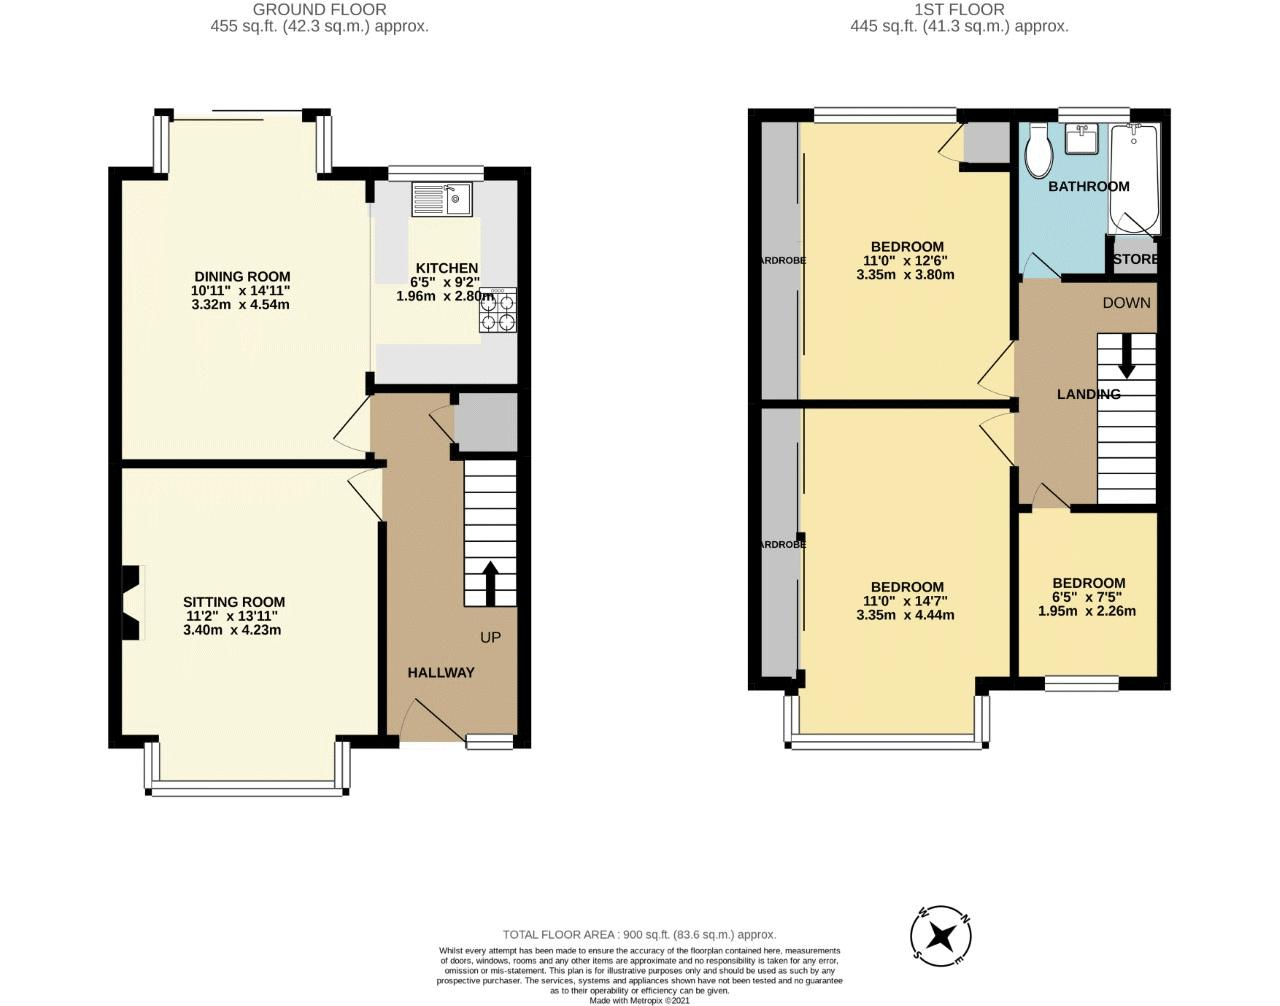 3 bedroom terraced house SSTC in Cheam - floorplan 1.